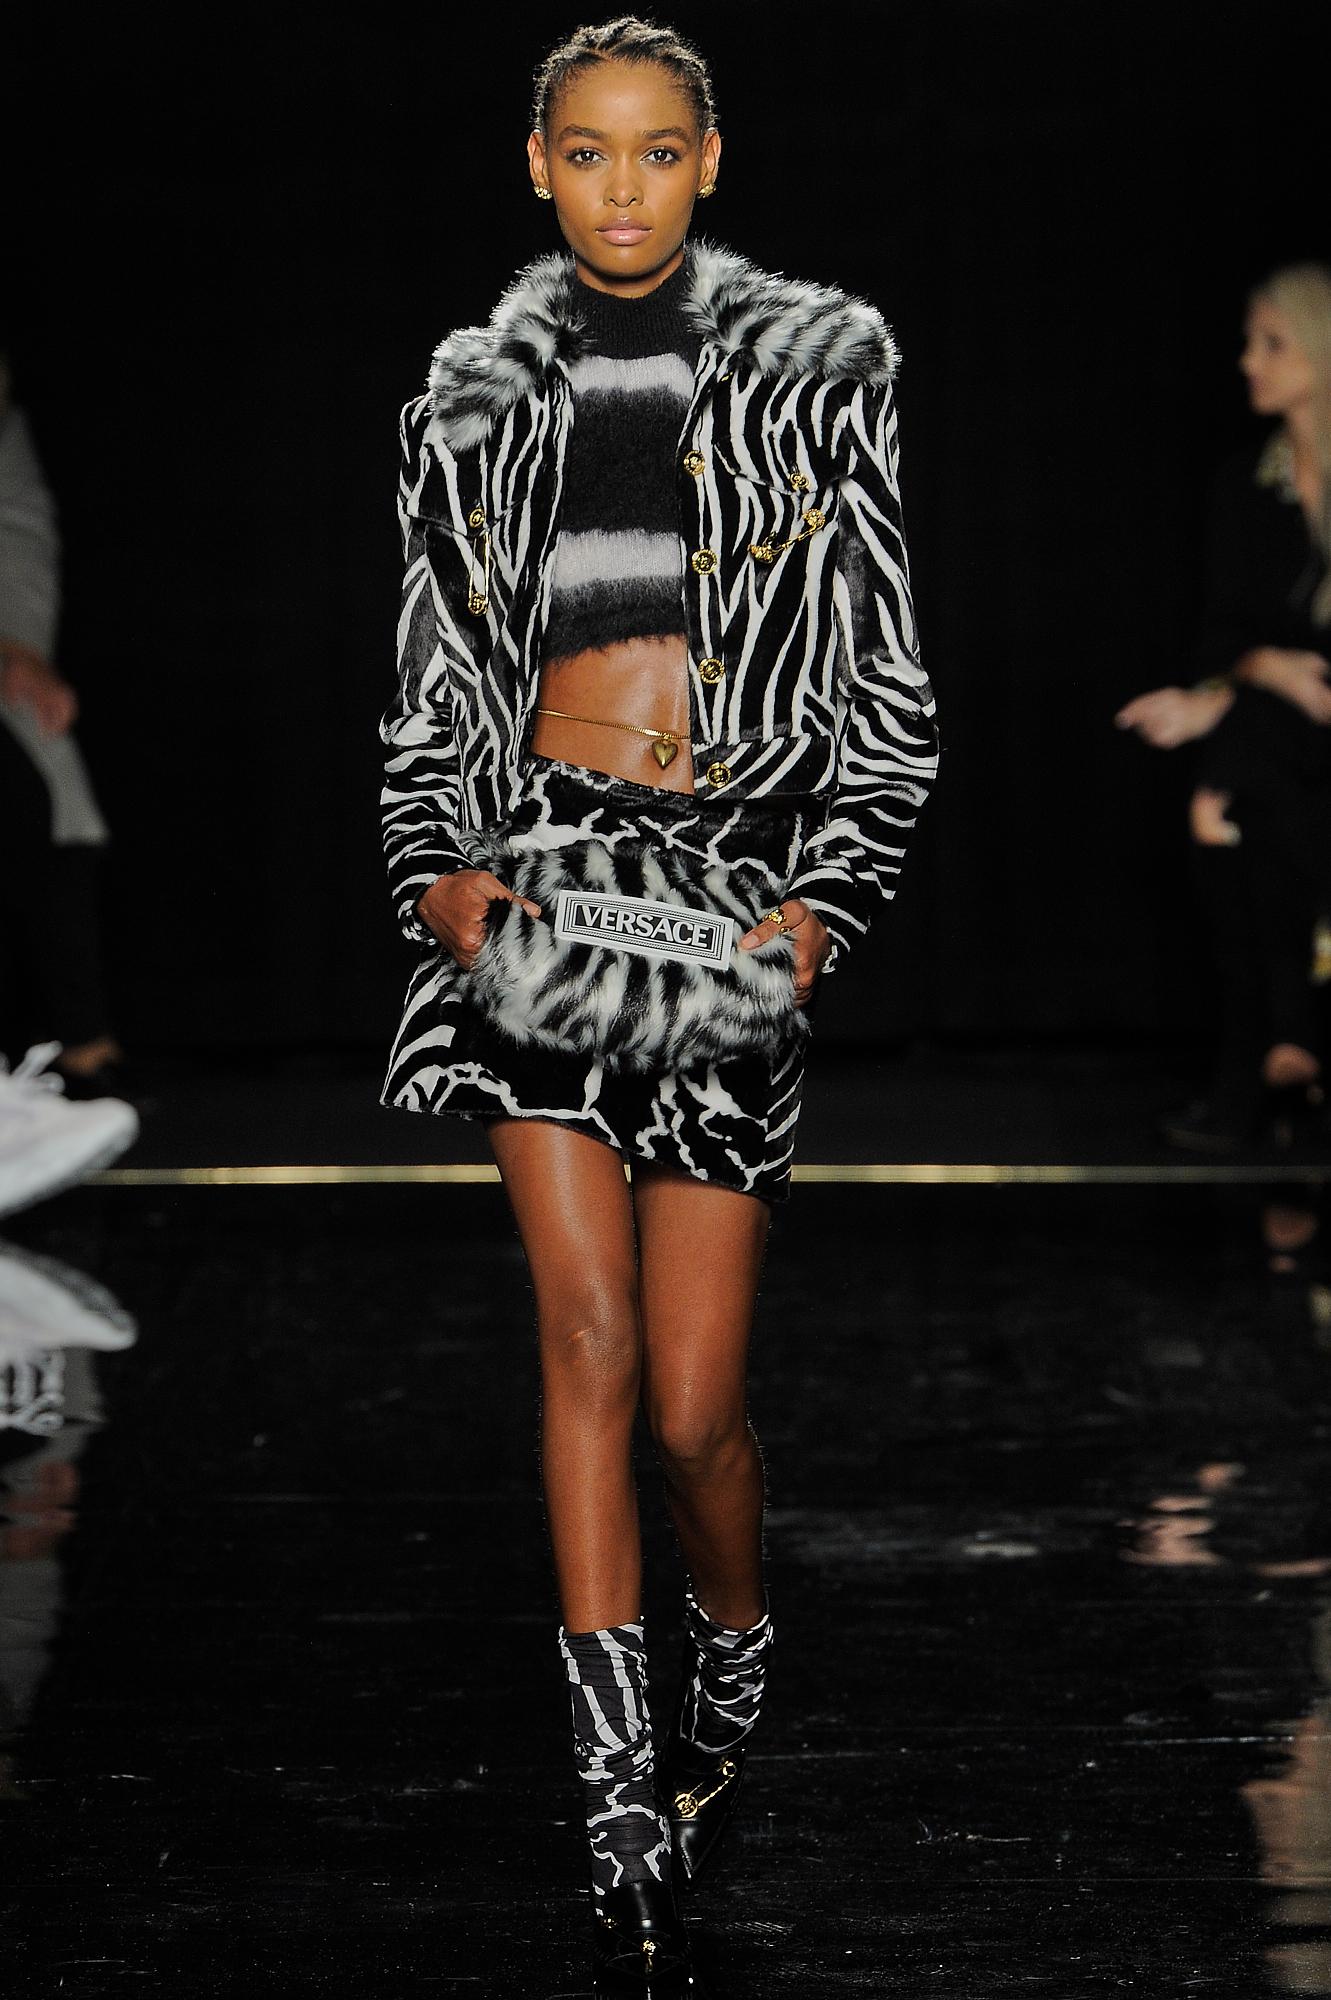 Versace_22_d9_versace_runway_runway_00022.jpg